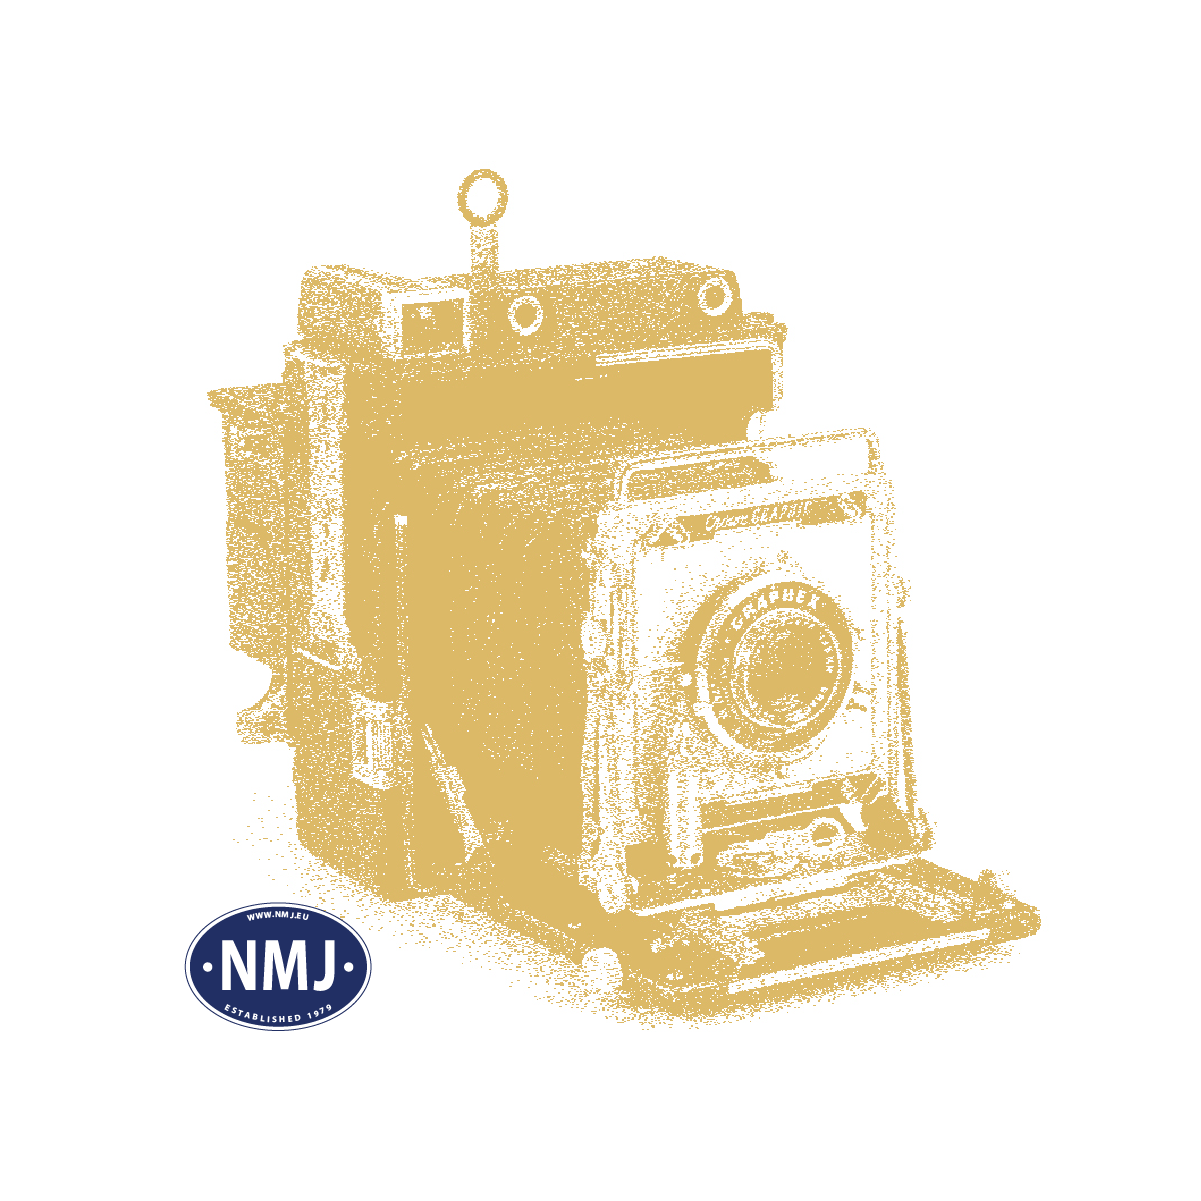 NMJT86.401AC - NMJ Topline NSB El11.2102, Nydesign, AC Digital